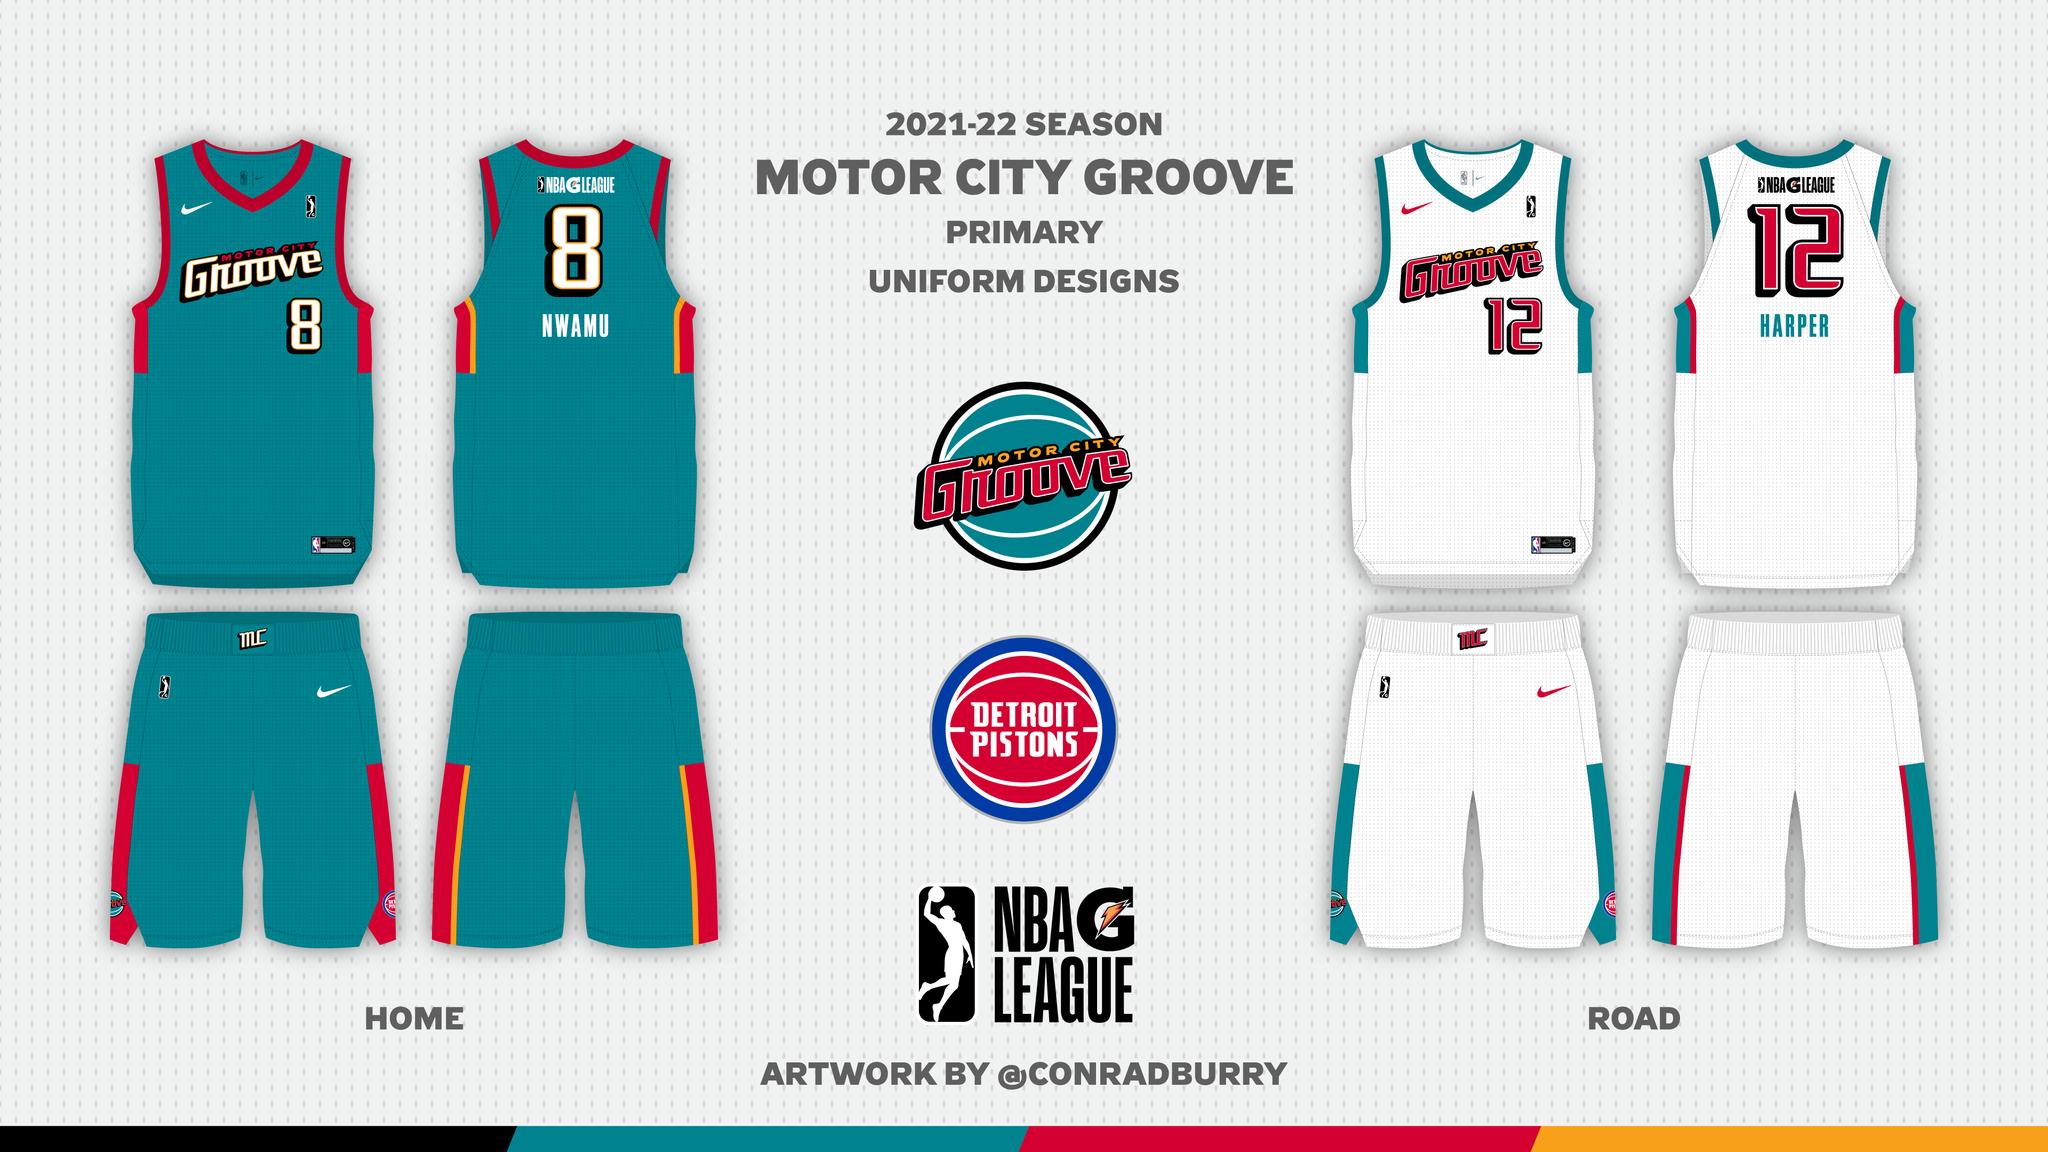 Conrad Burry On Twitter In 2020 Detroit Basketball Motor City Basketball Teams